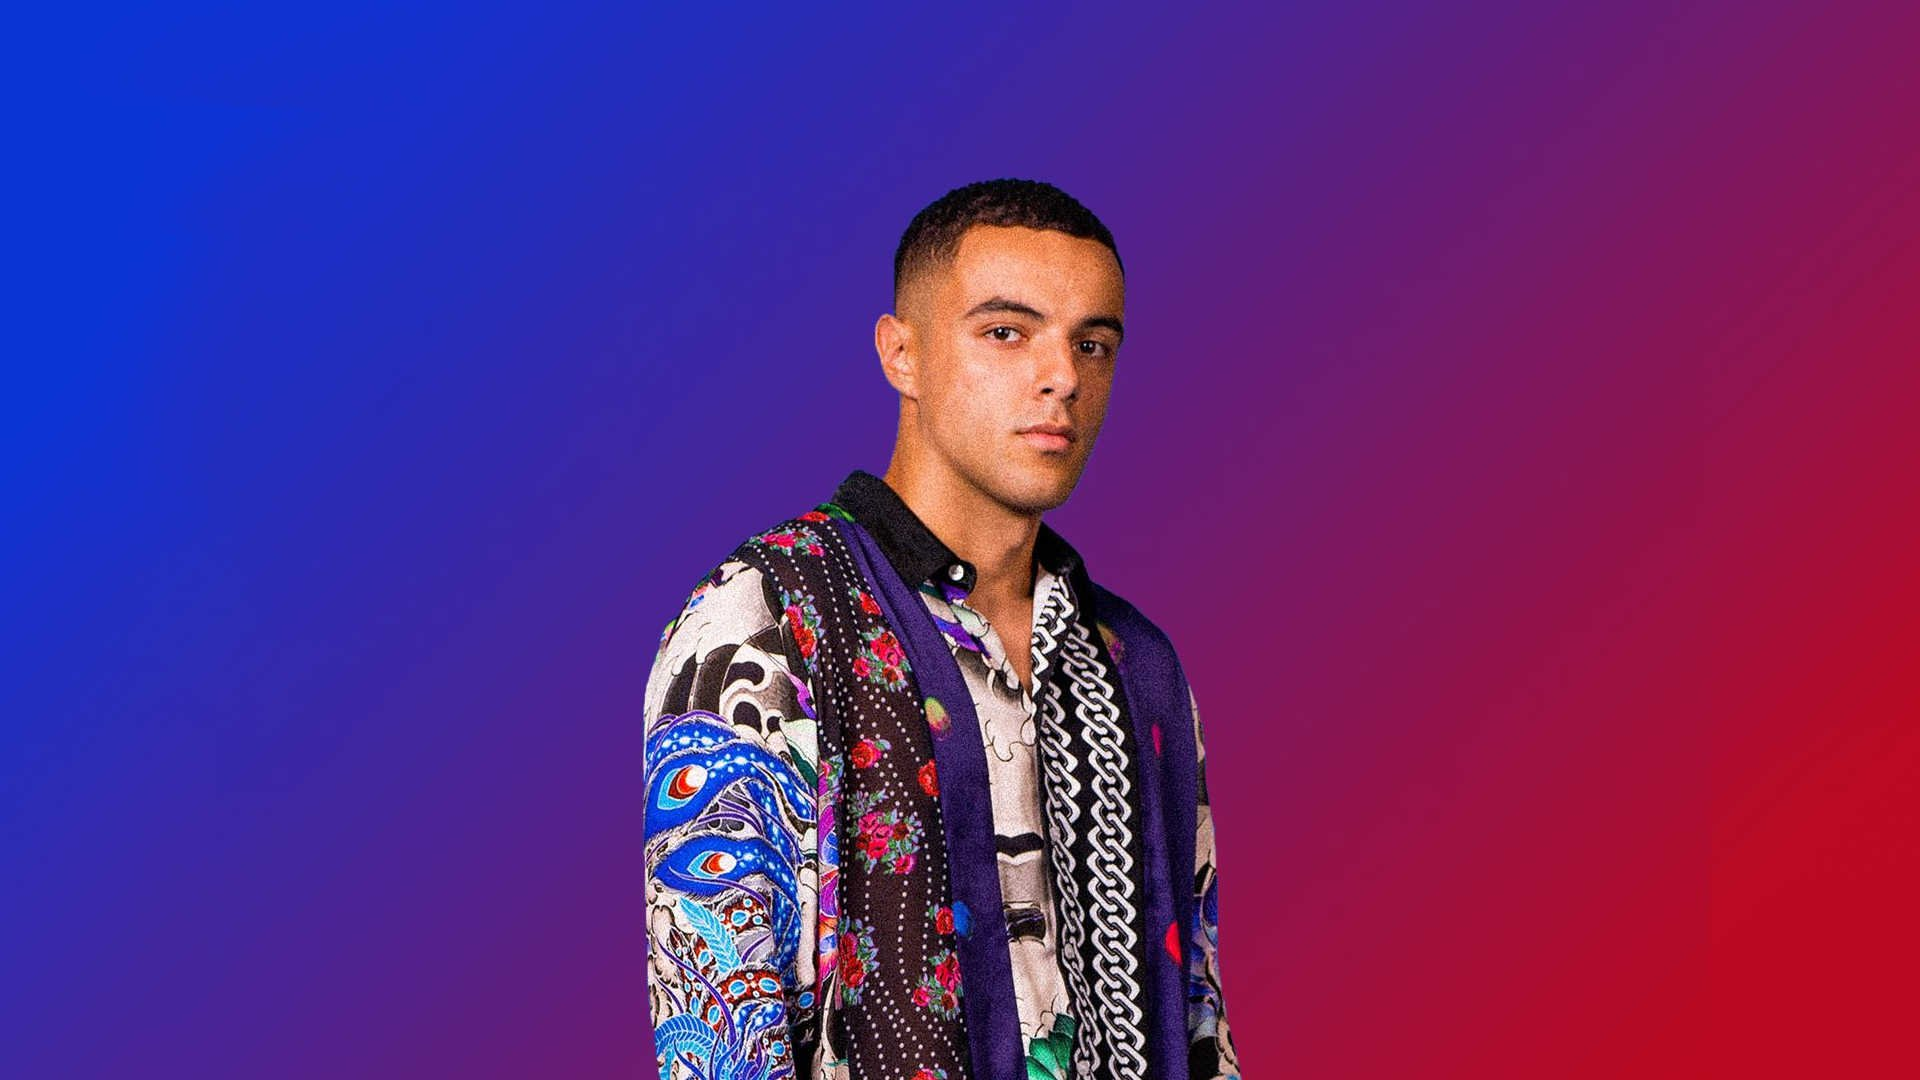 Karim Naas, KTK, EDM, Threw a Party, House, Trance, Electronica, Music, Pop, DJ, Producer, Mason Vera Paine, Millennial, Unabridged Millennial, MasonVeraPaine.com, MVP Show, Team MVP, French Producer